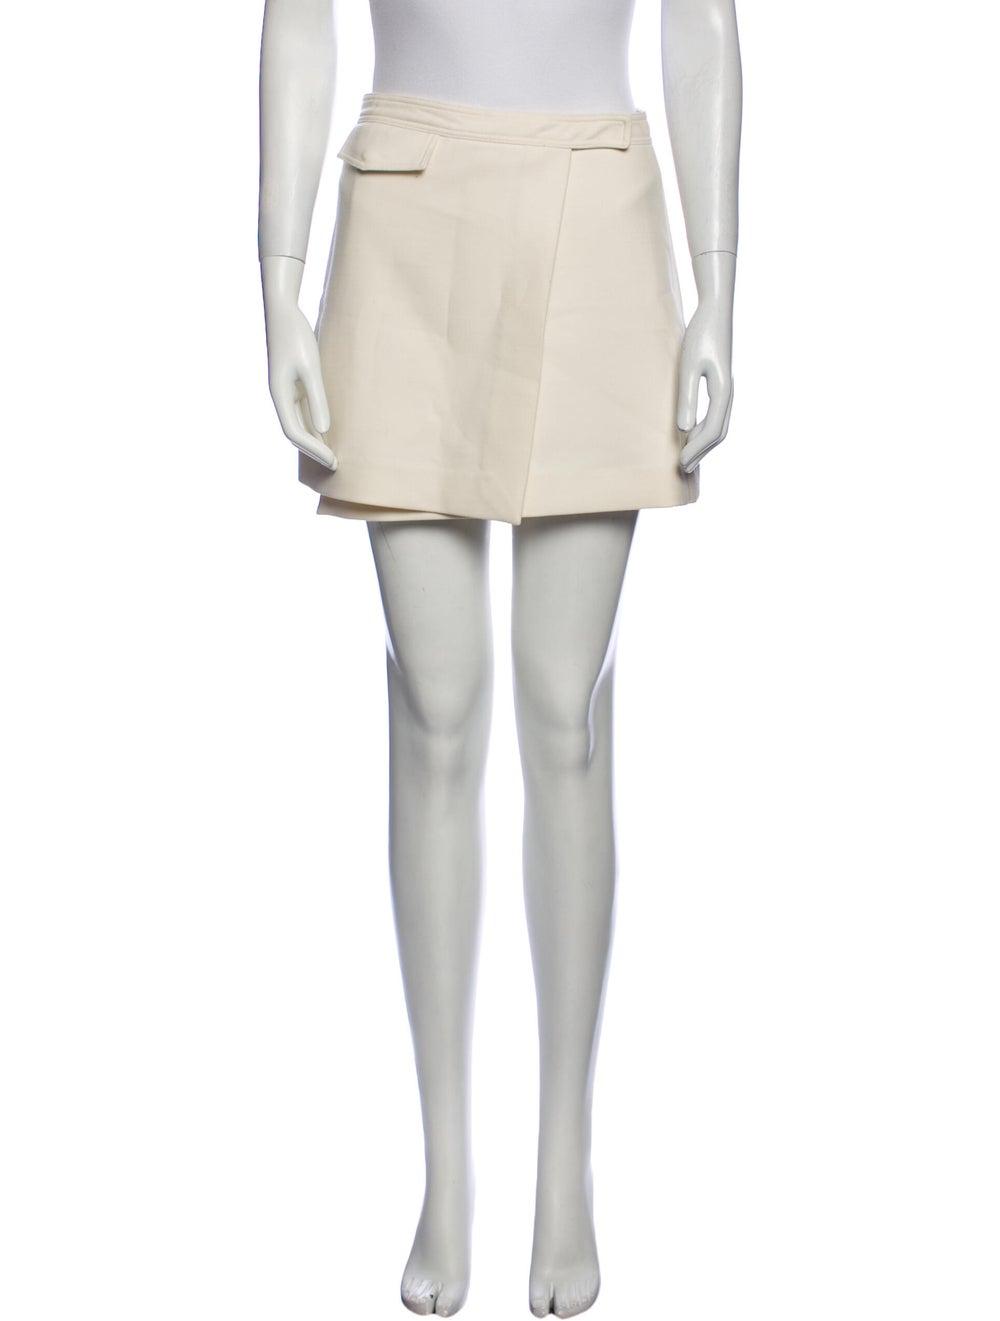 Theory Mini Skirt - image 1